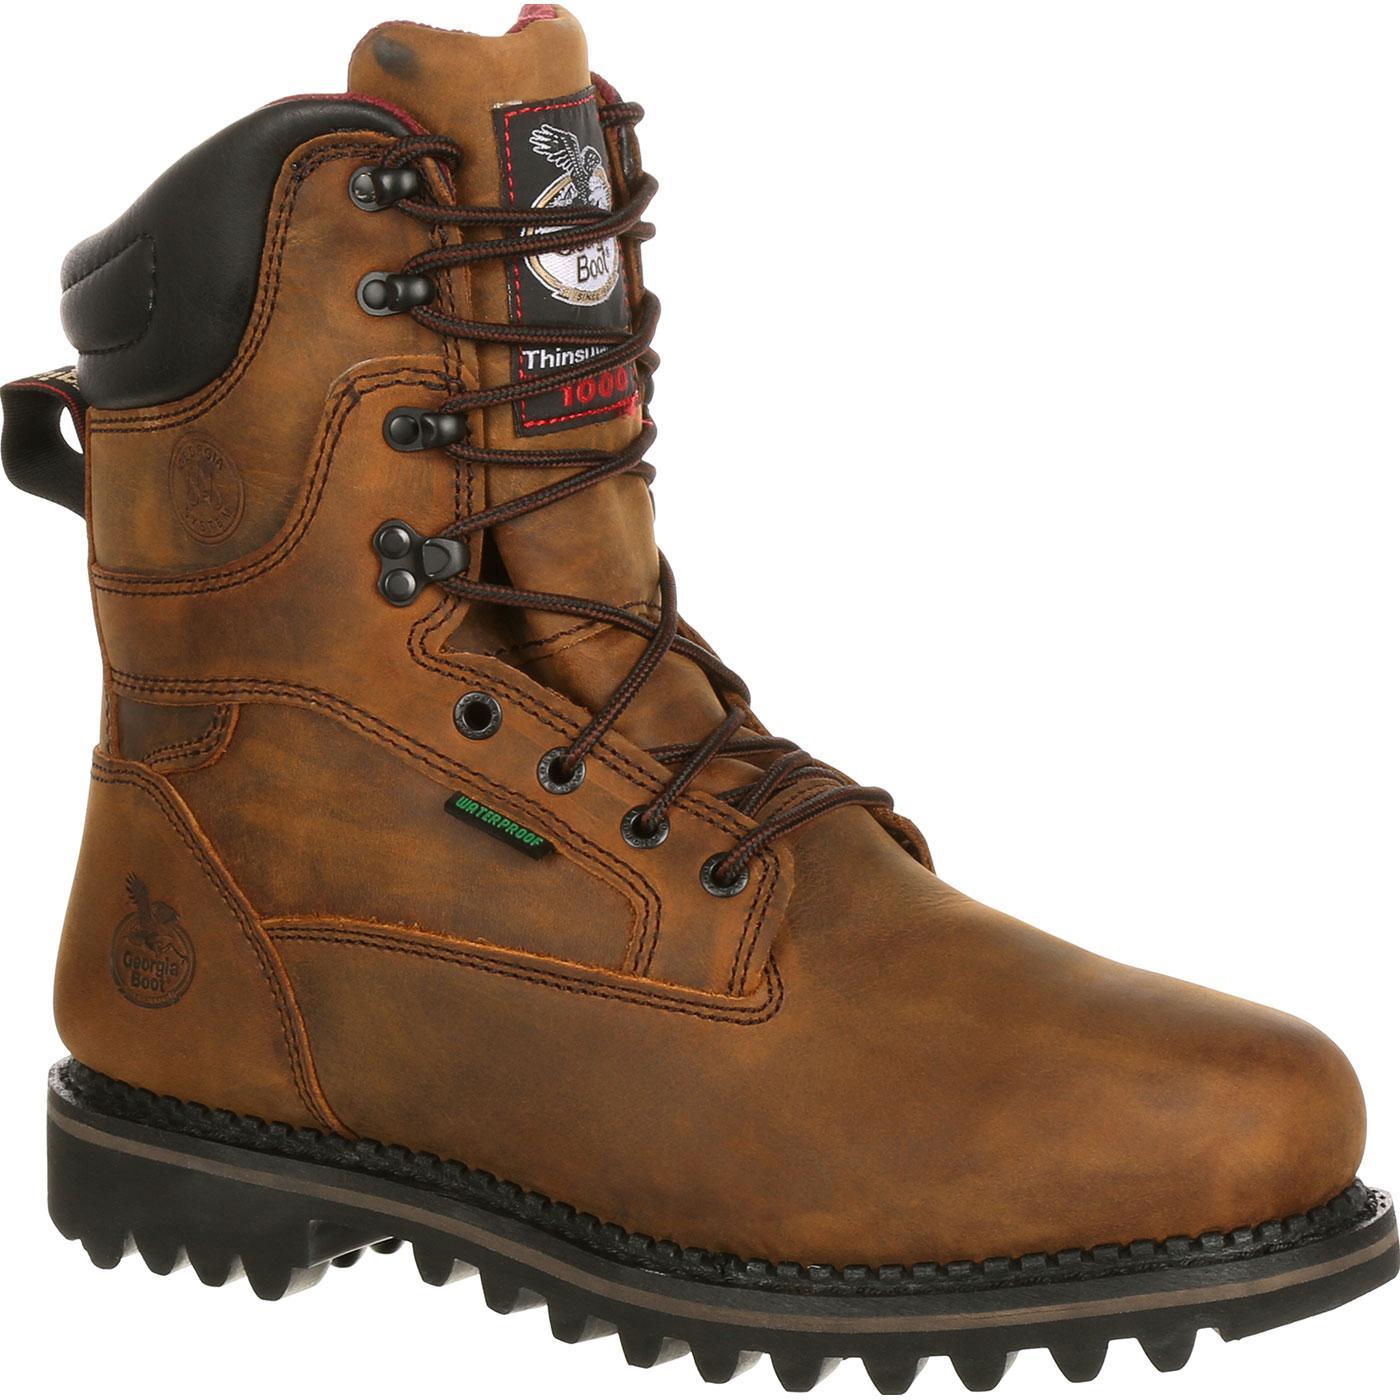 Georgia Boot Arctic Toe Waterproof Insulated Work Boots